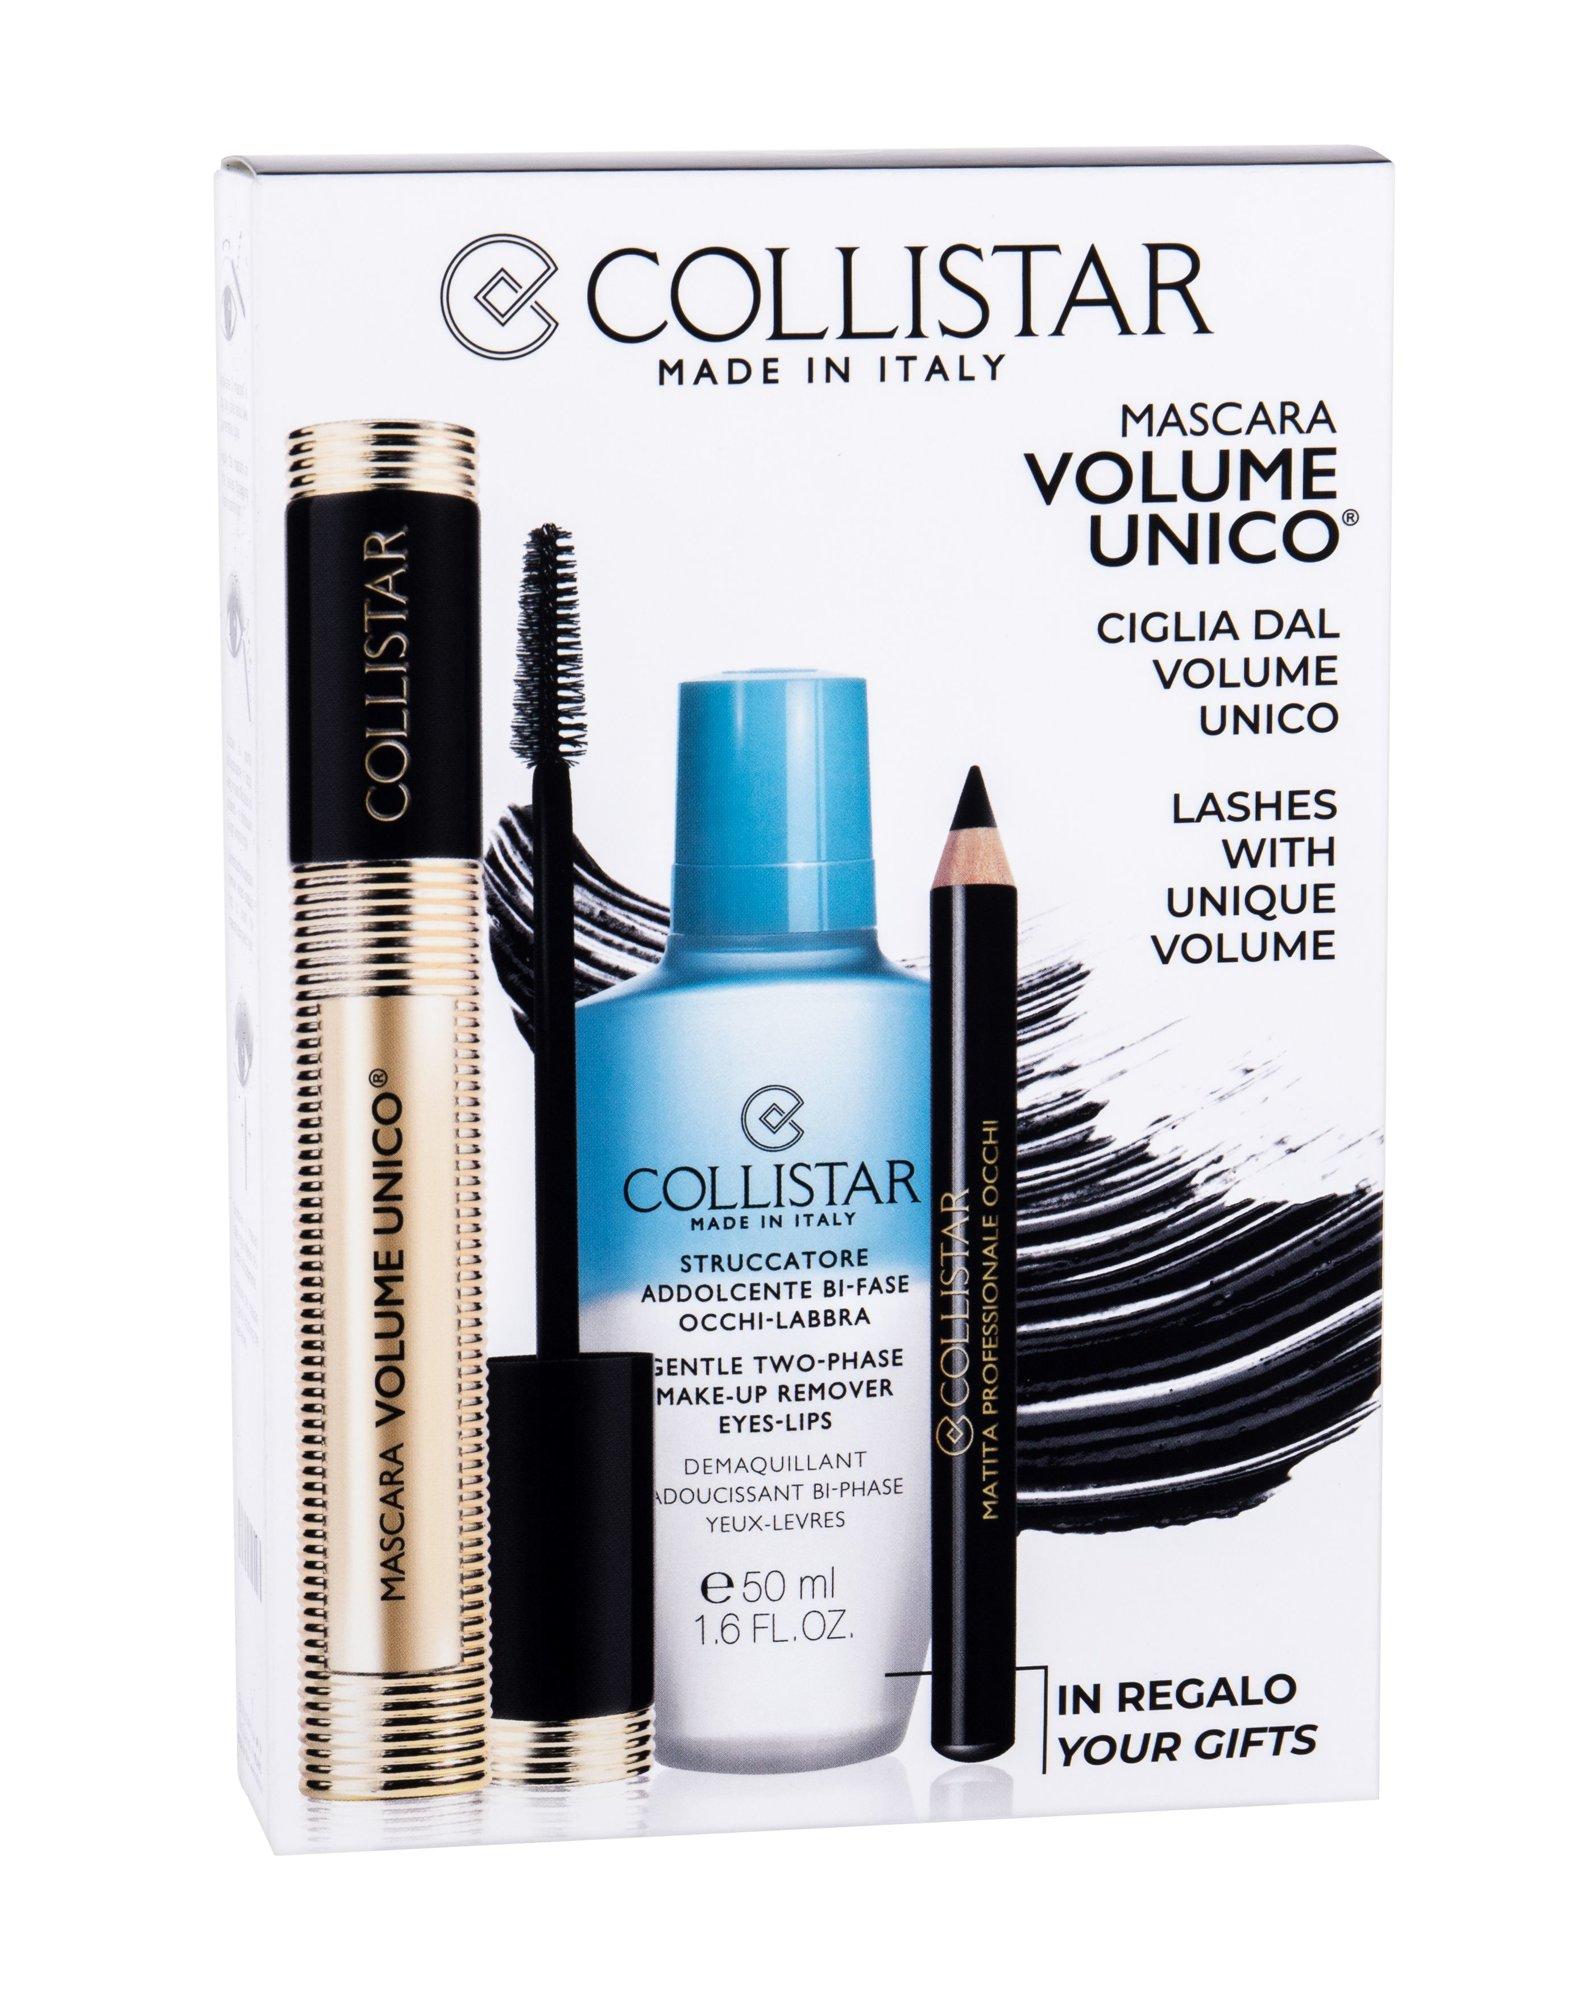 Collistar Volume Unico - (Intense Black) řasenka 13 ml + odličovací přípravek Gentle Two-Phase 50 ml + tužka na oči Professional Eye Pencil 0,8 g Black W Objem: 13 ml